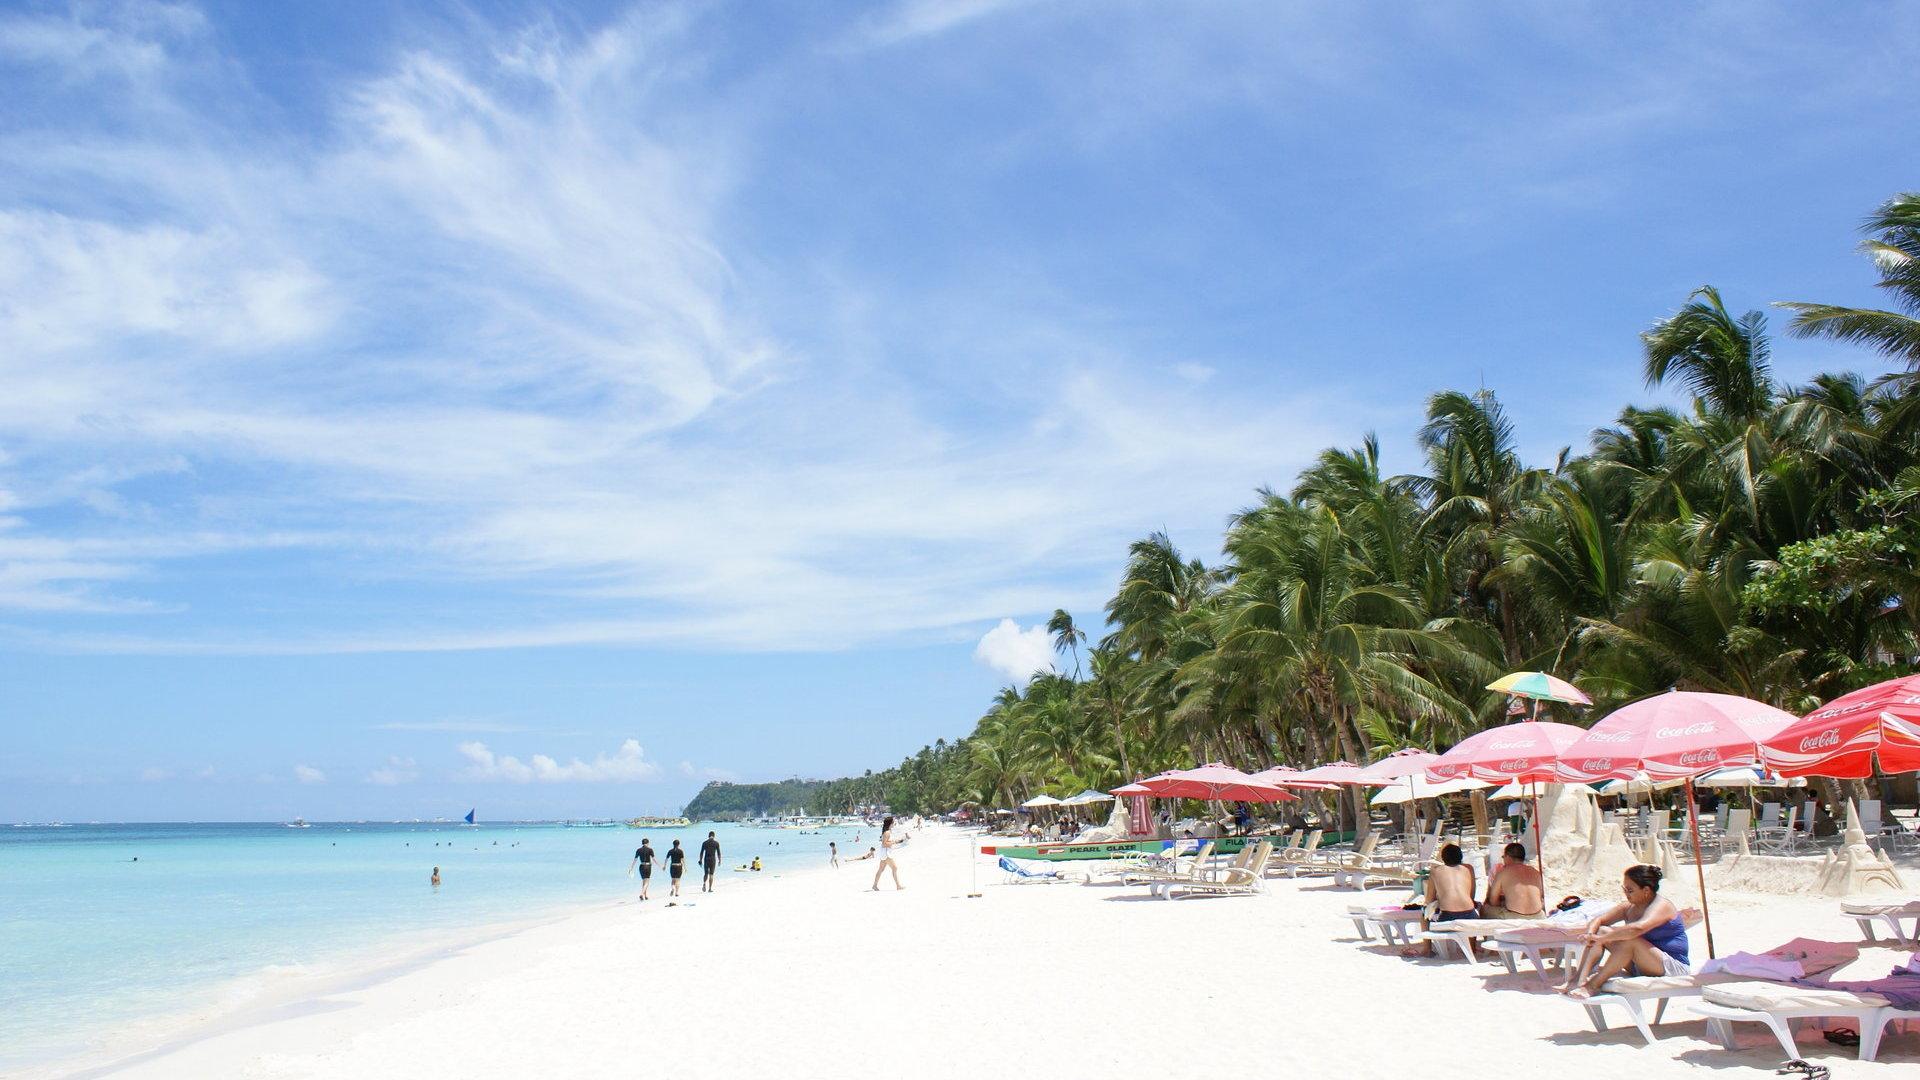 boracay beach hq wide - photo #2